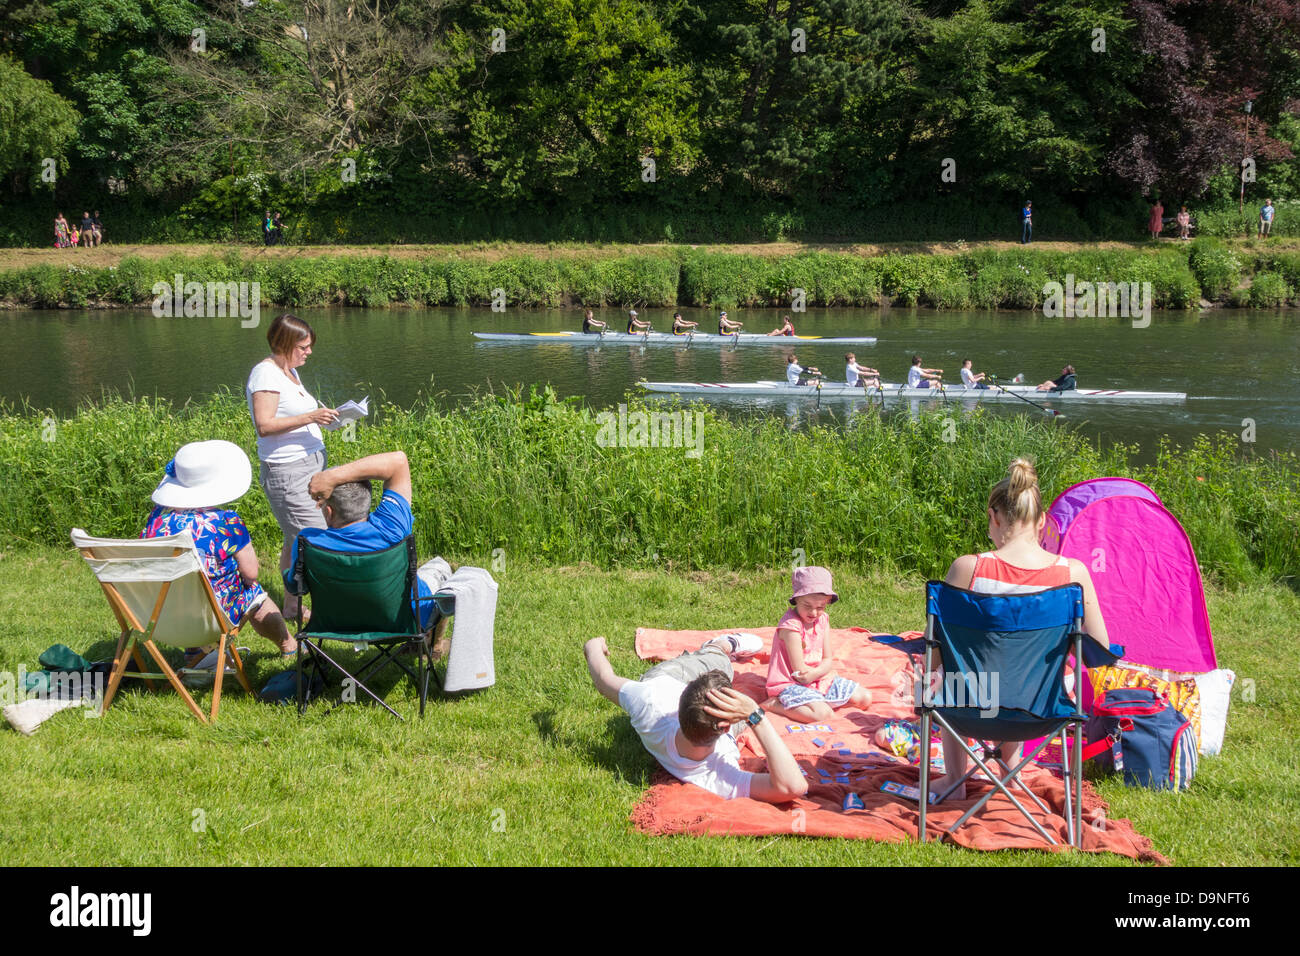 People on the riverside at Durham during Durham rowing regatta. Durham, England, UK - Stock Image